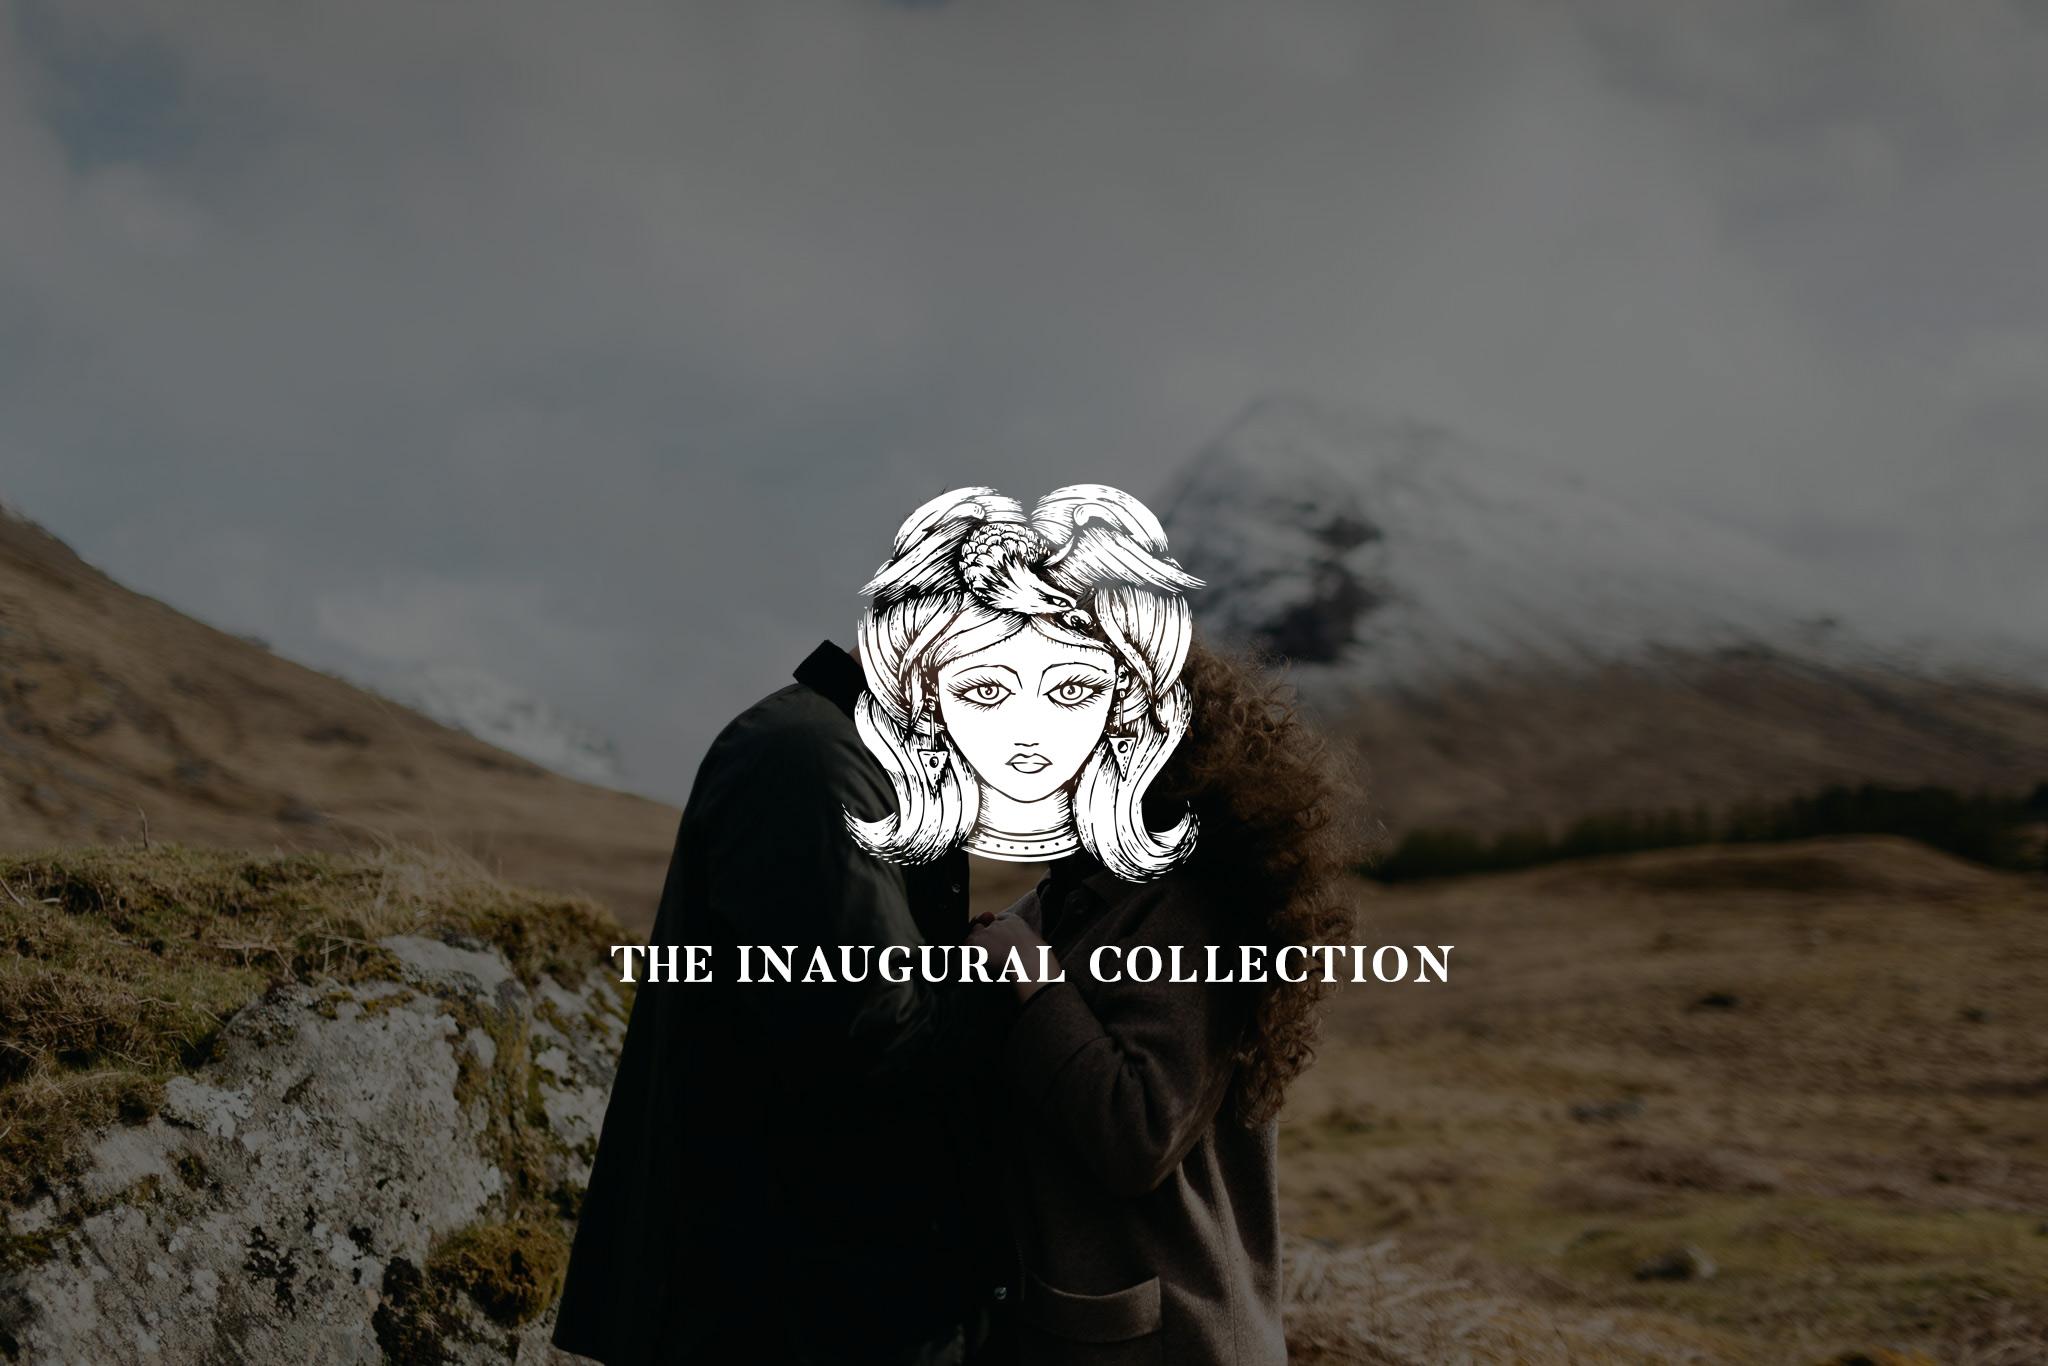 inaugural-collection.jpg